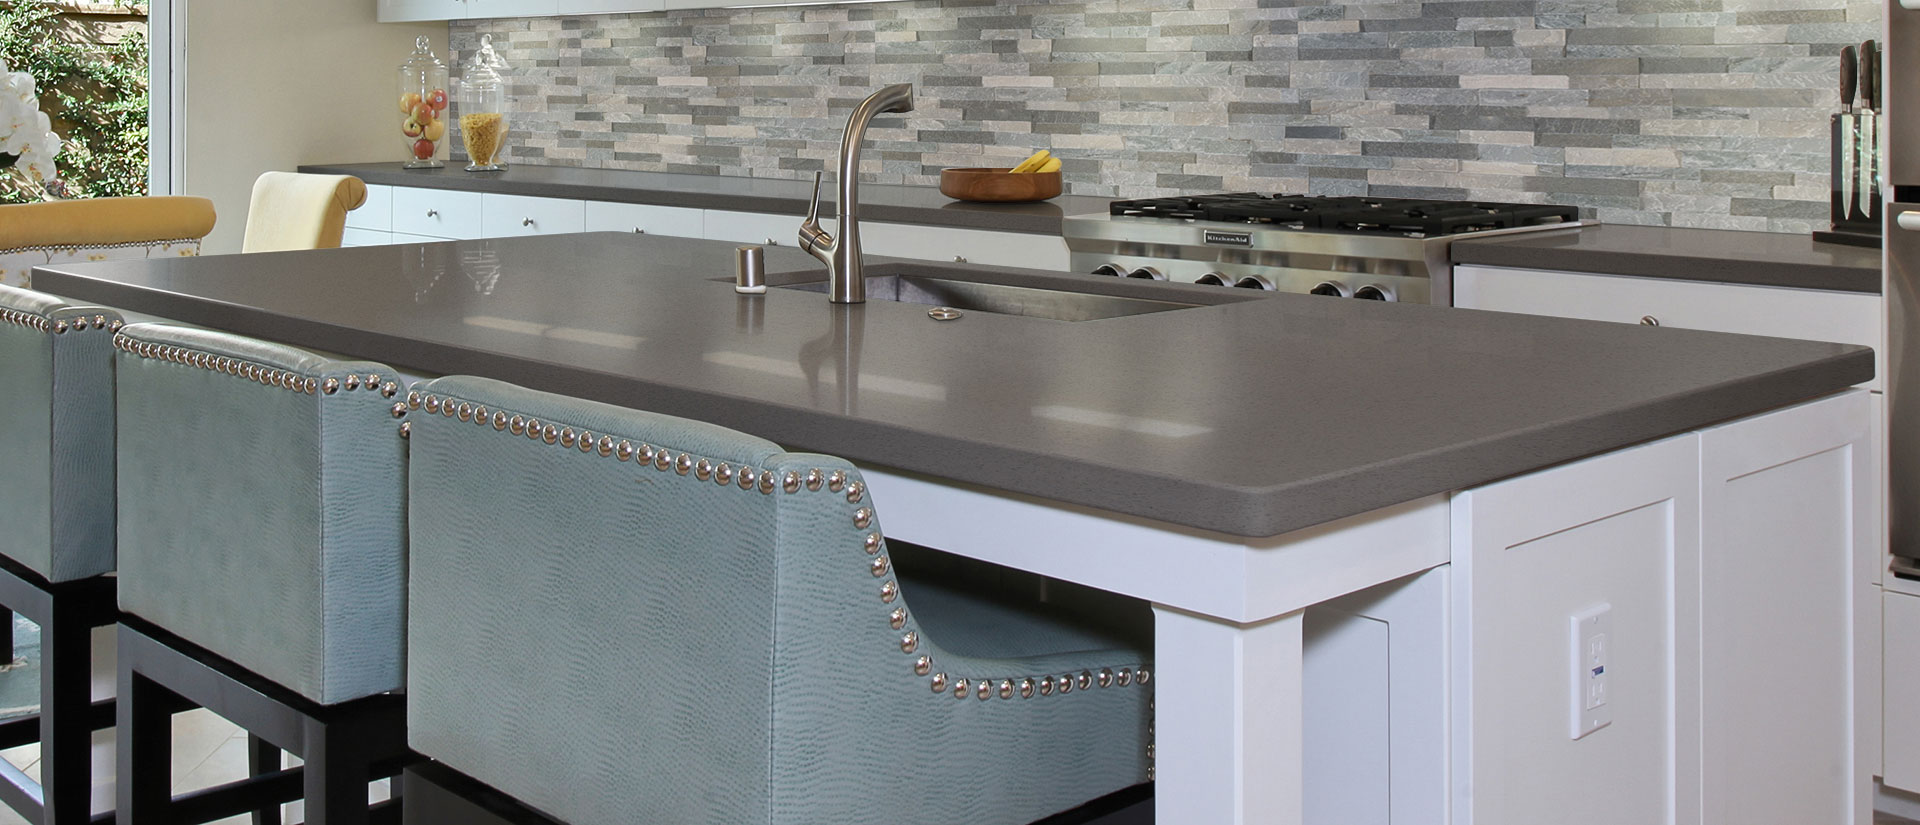 Iced Grey Quartz Countertops